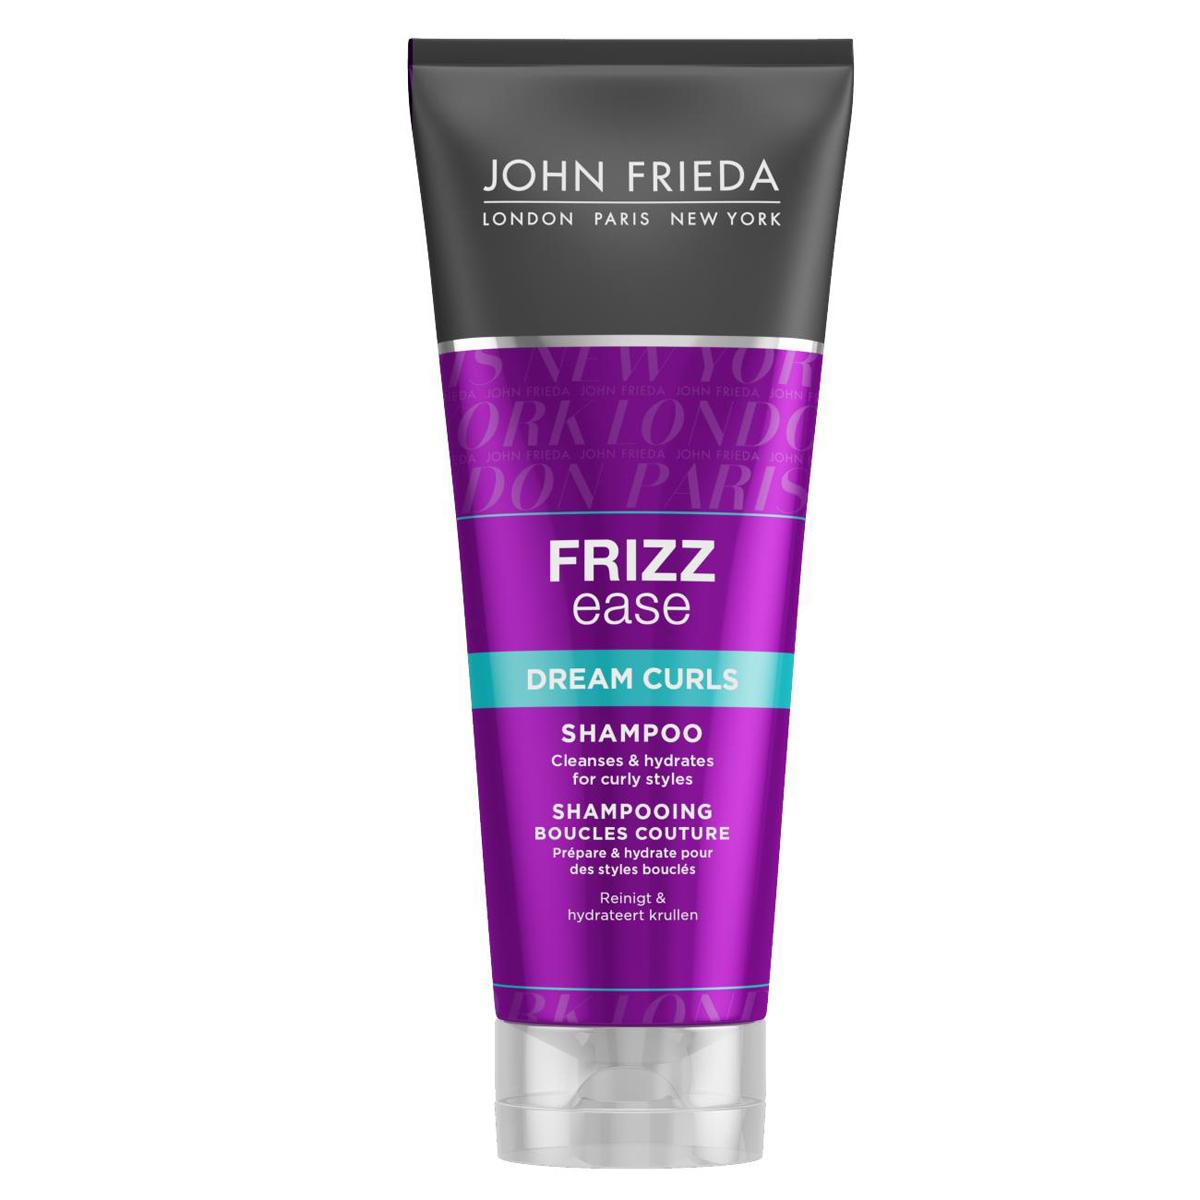 John Frieda Шампунь Frizz-Ease. Dream Curls, для волнистых и вьющихся волос, 250 мл lee stafford шампунь для вьющихся волос here come the curls 250 мл